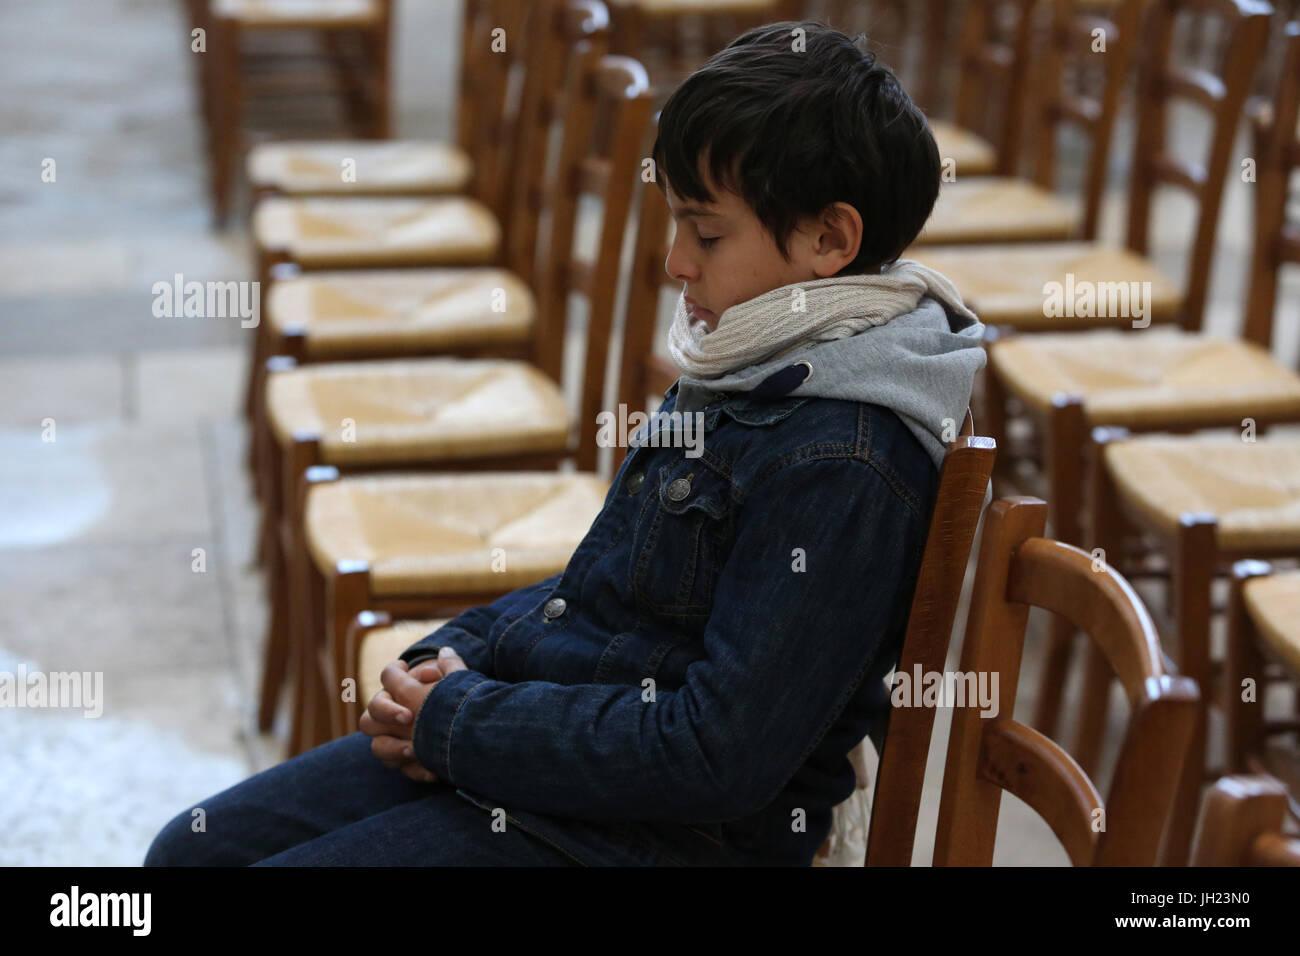 11-year-old boy in church. France. Stock Photo